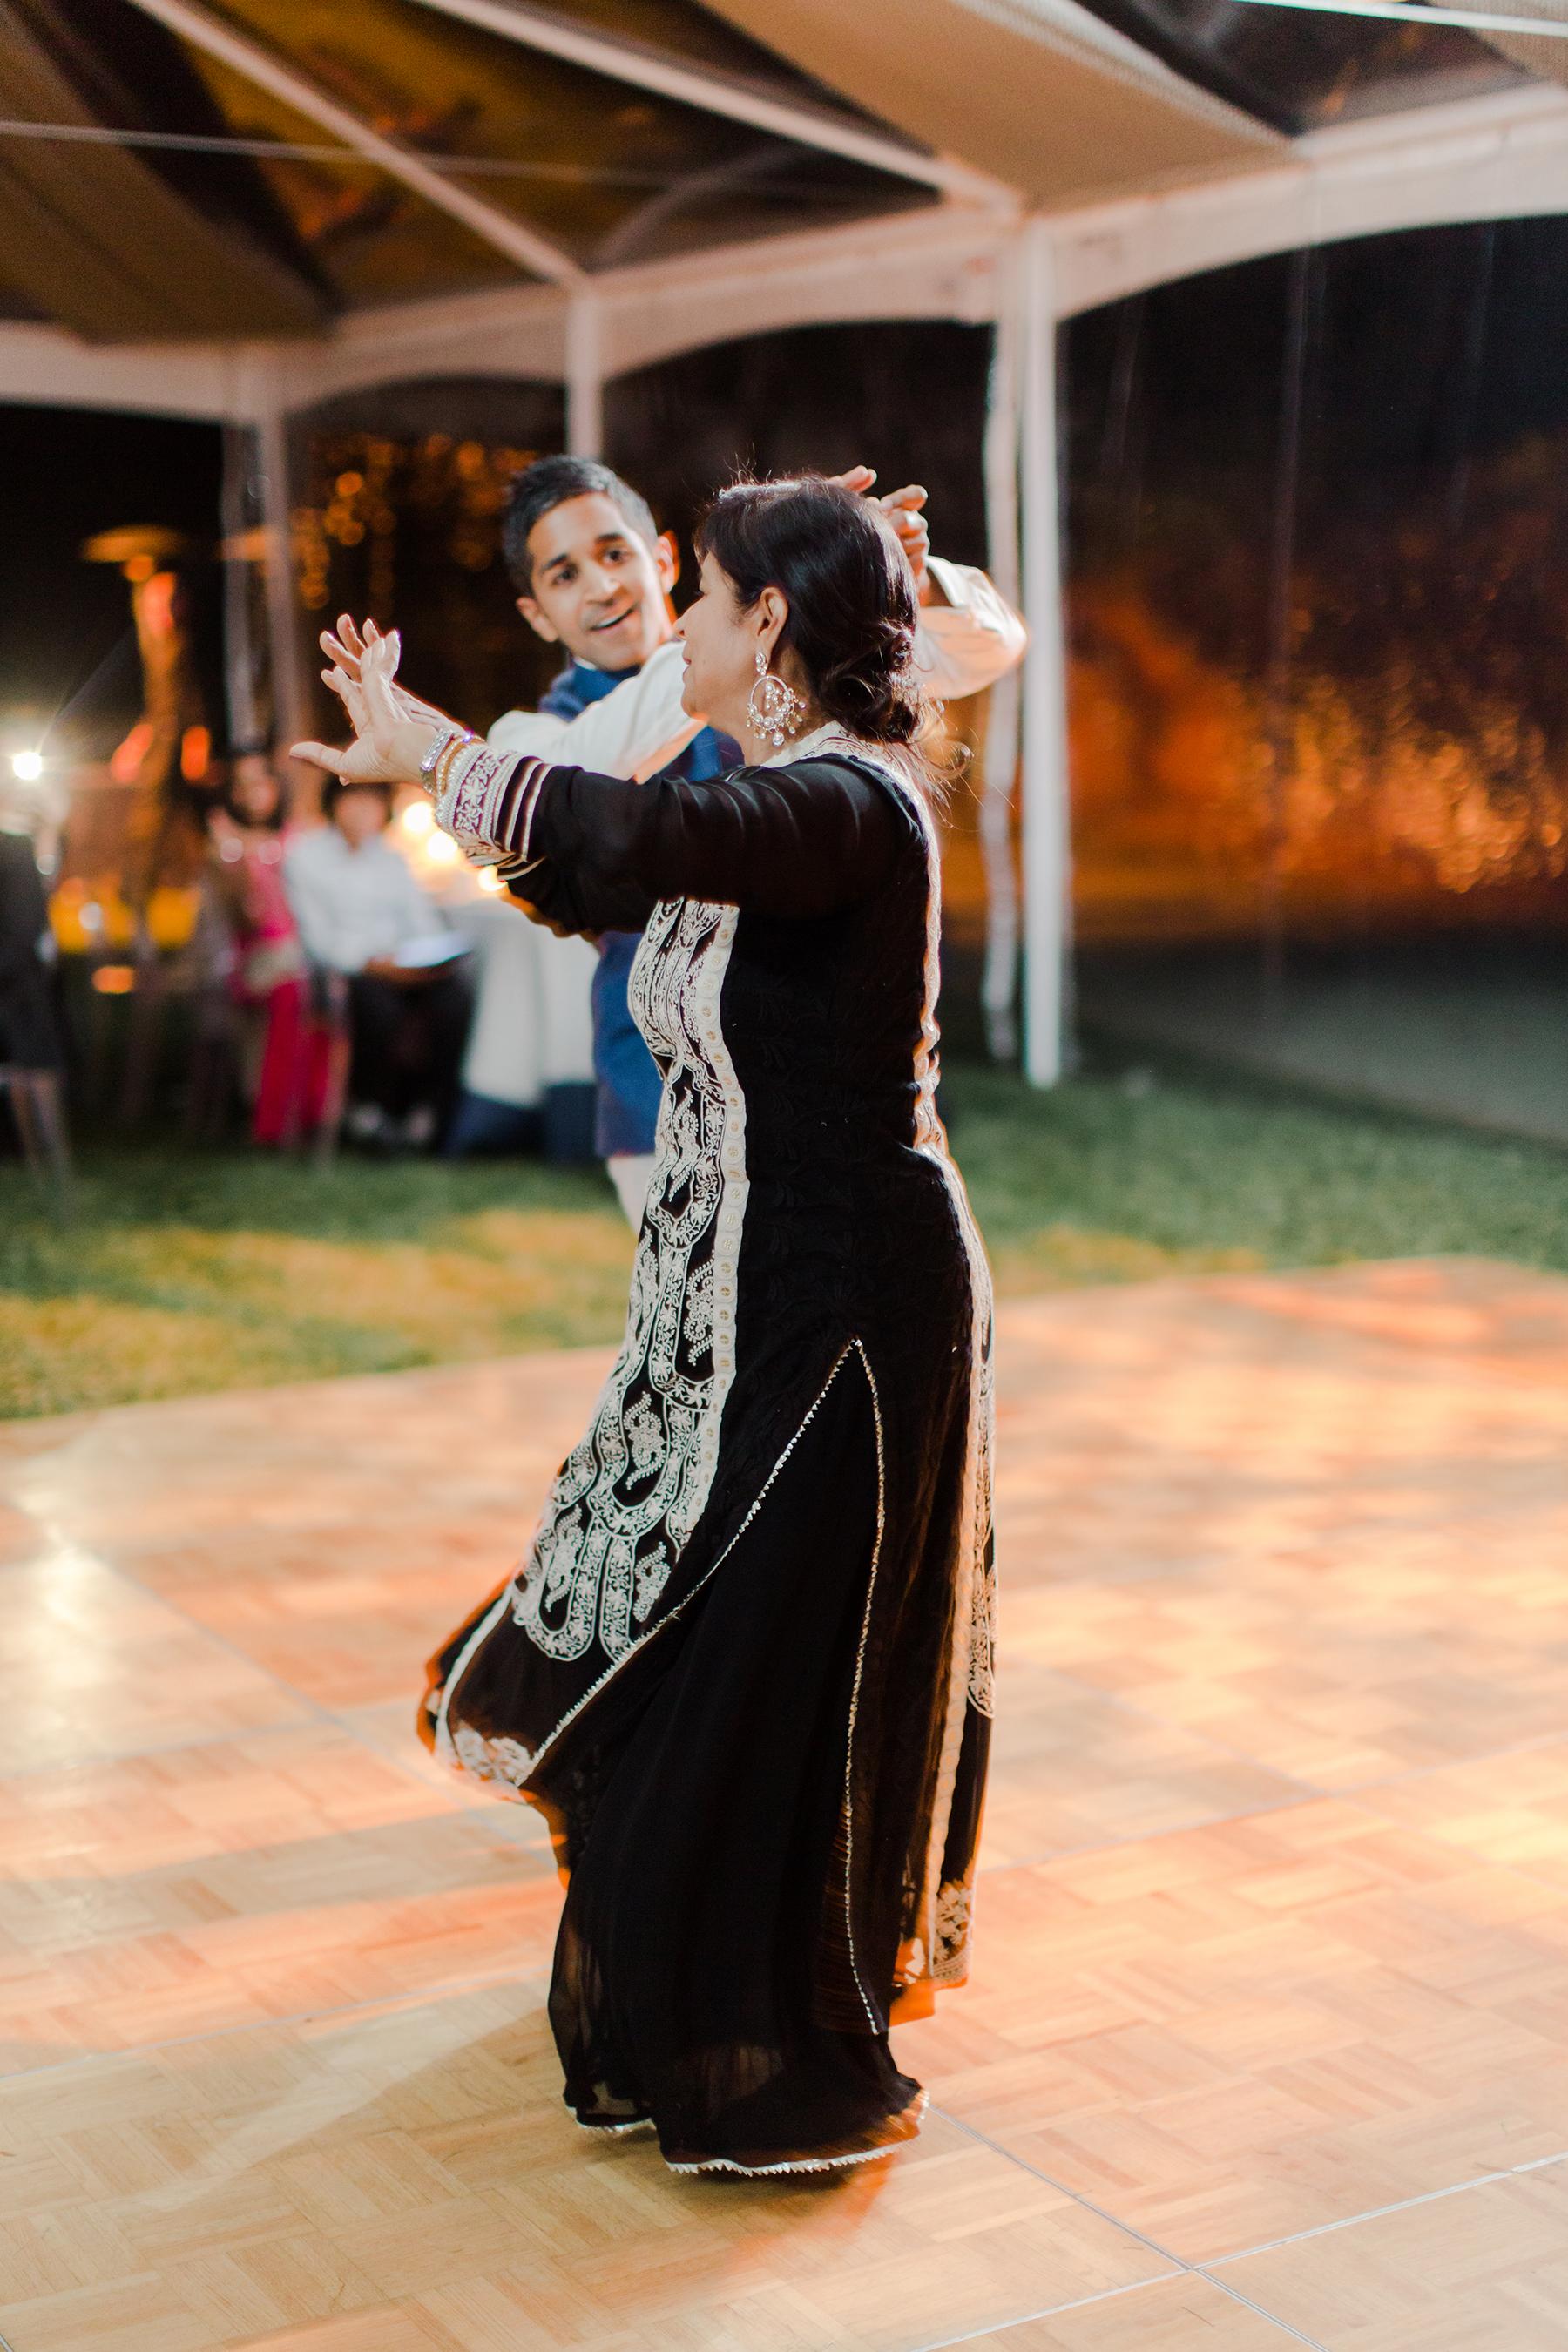 jenna alok welcome party mom dance